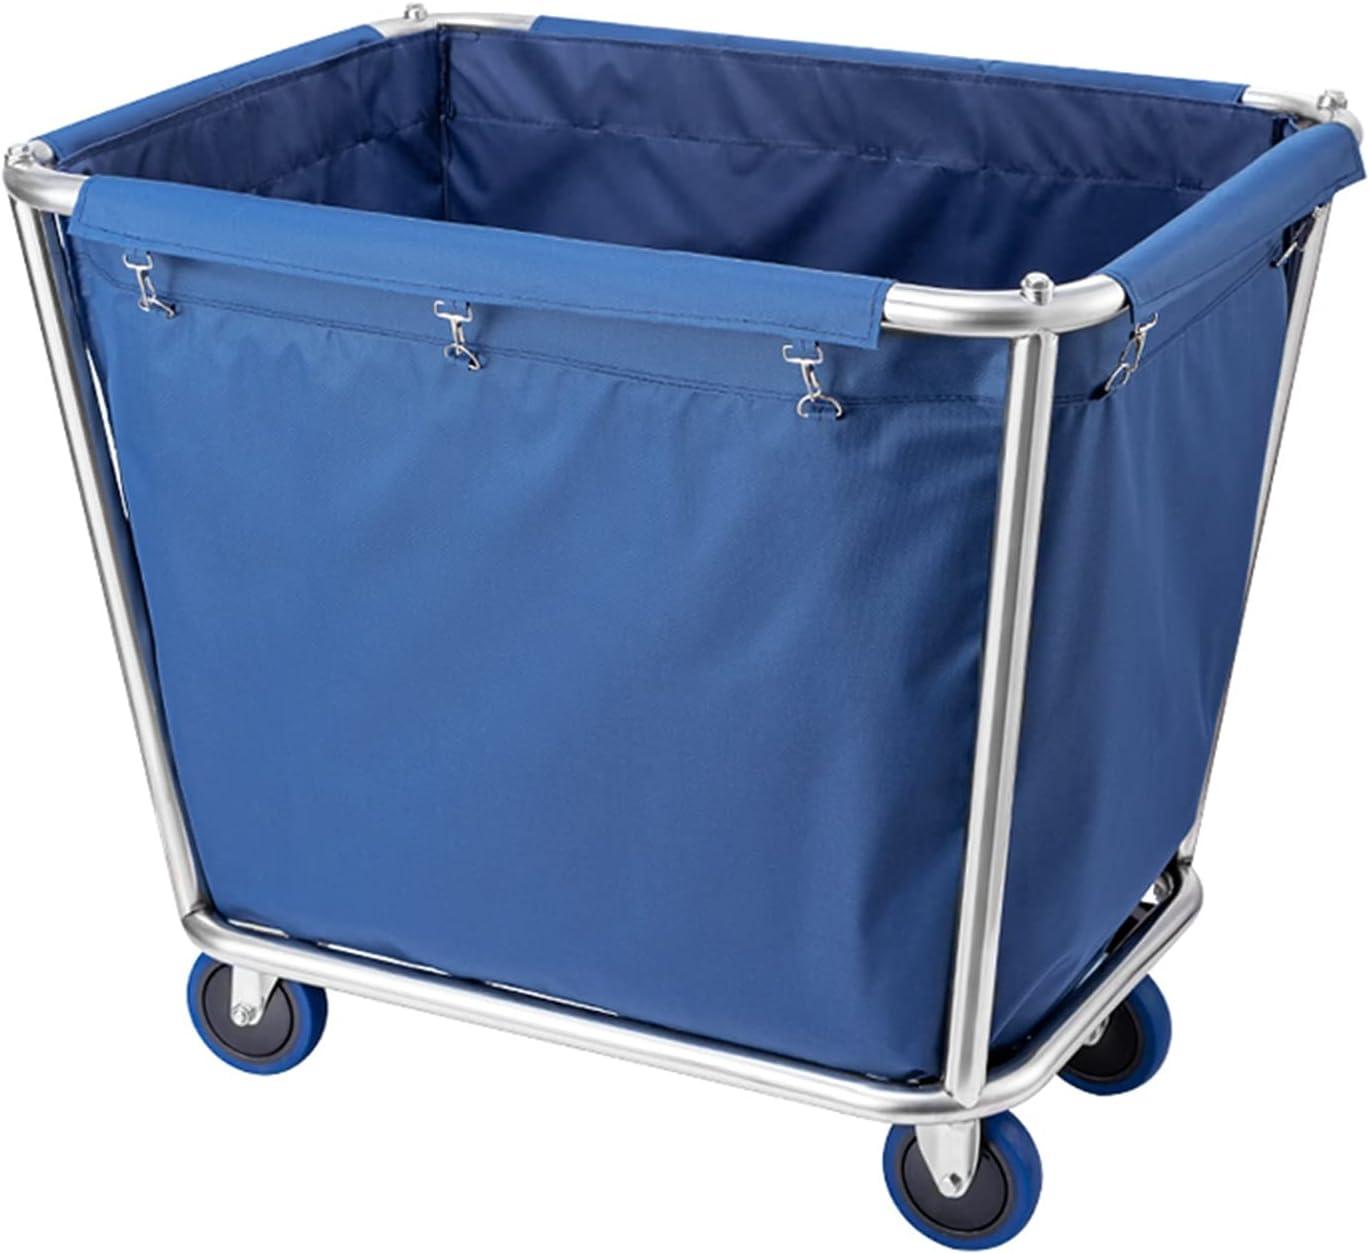 ZXXL Heavy Popular brand in the world Duty Laundry Max 65% OFF Hamper Commercial Cart w Sorter